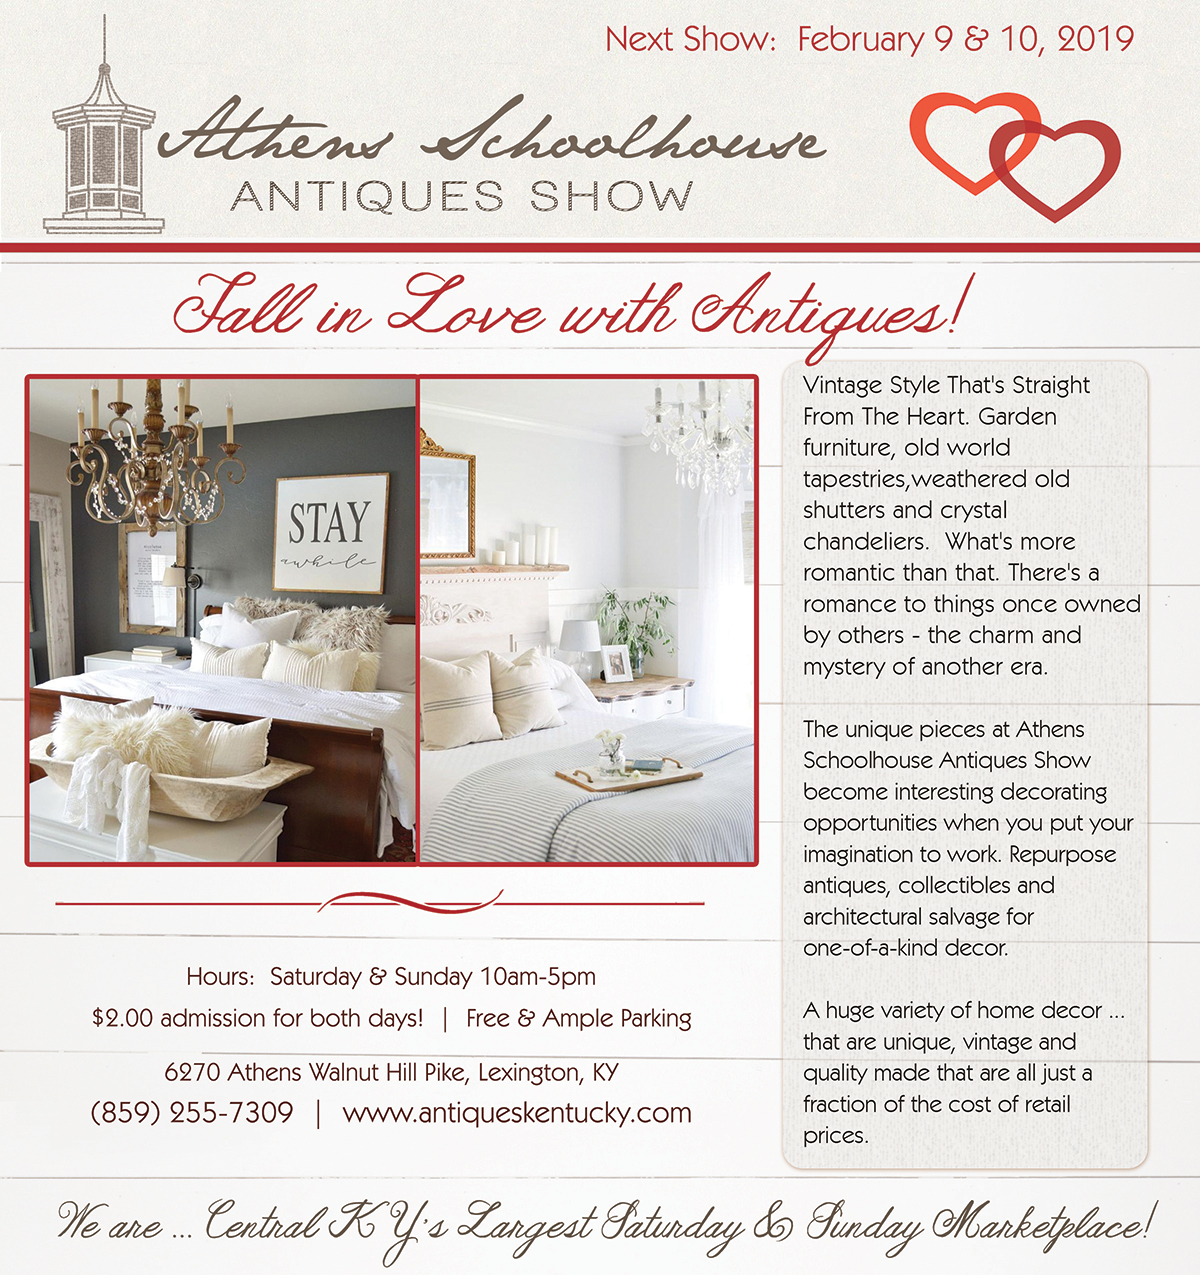 Athens Schoolhouse Antiques Show Kentucky Living,2 Bedroom Apartments For Rent Edmonton South